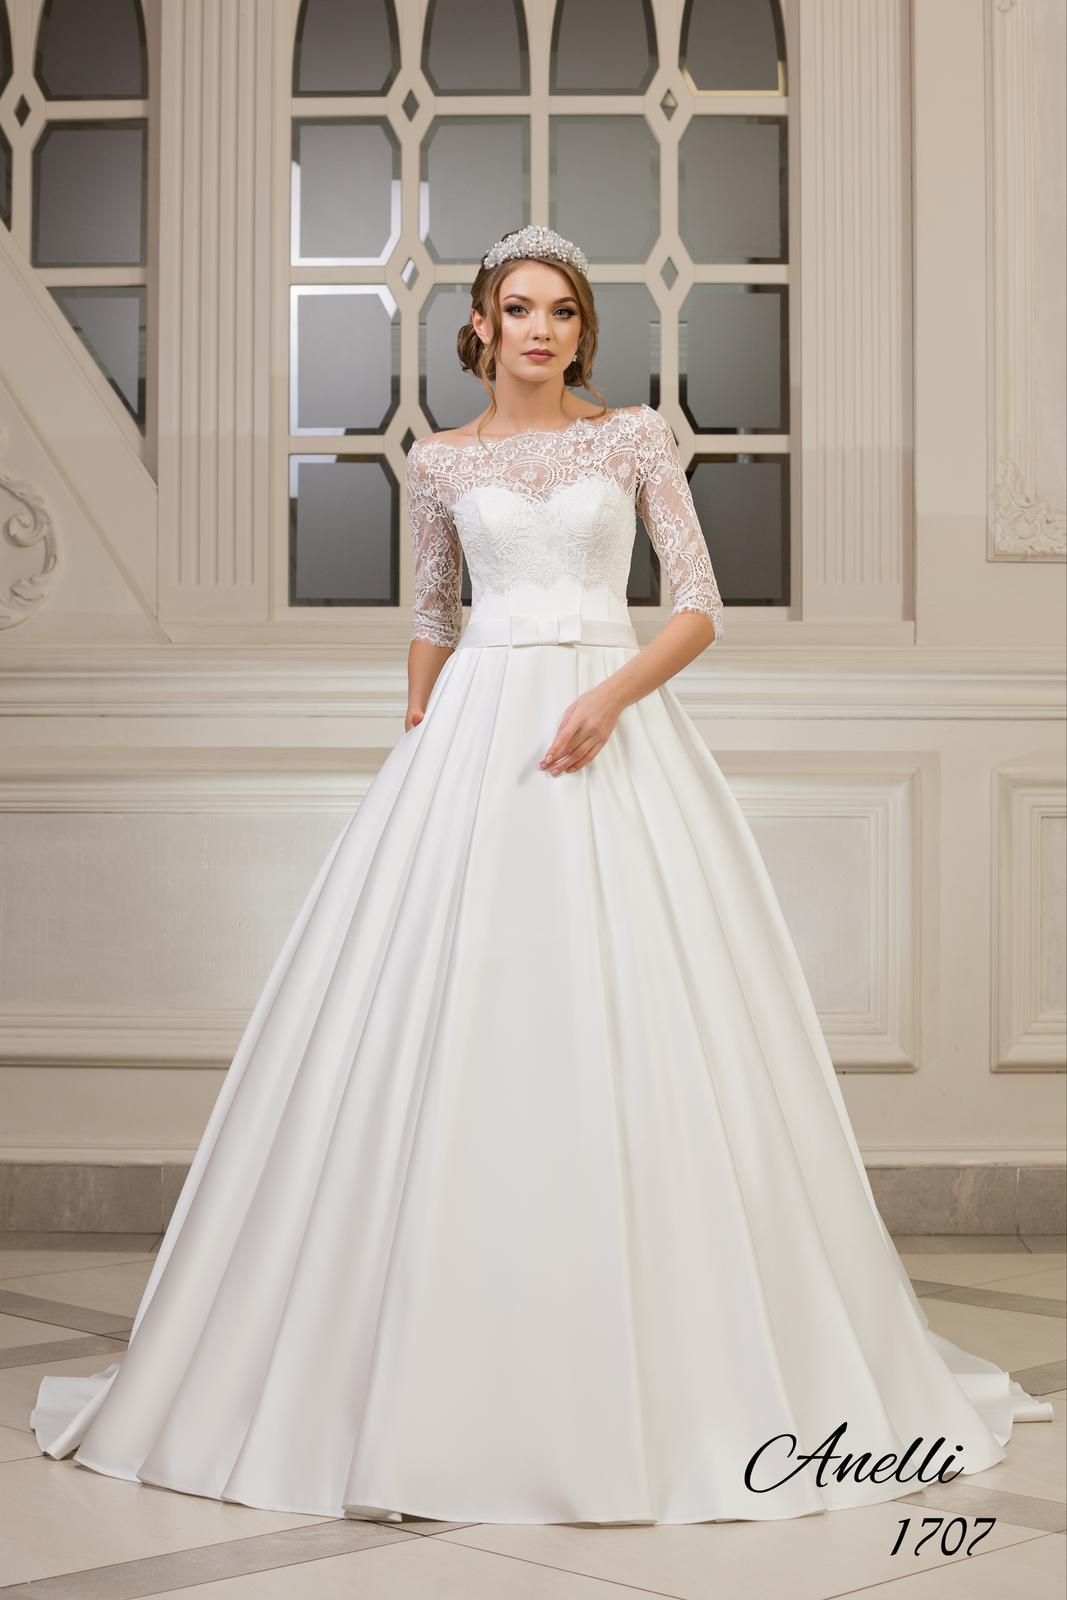 Svadobné šaty - Debut 1707 - Obrázok č. 1